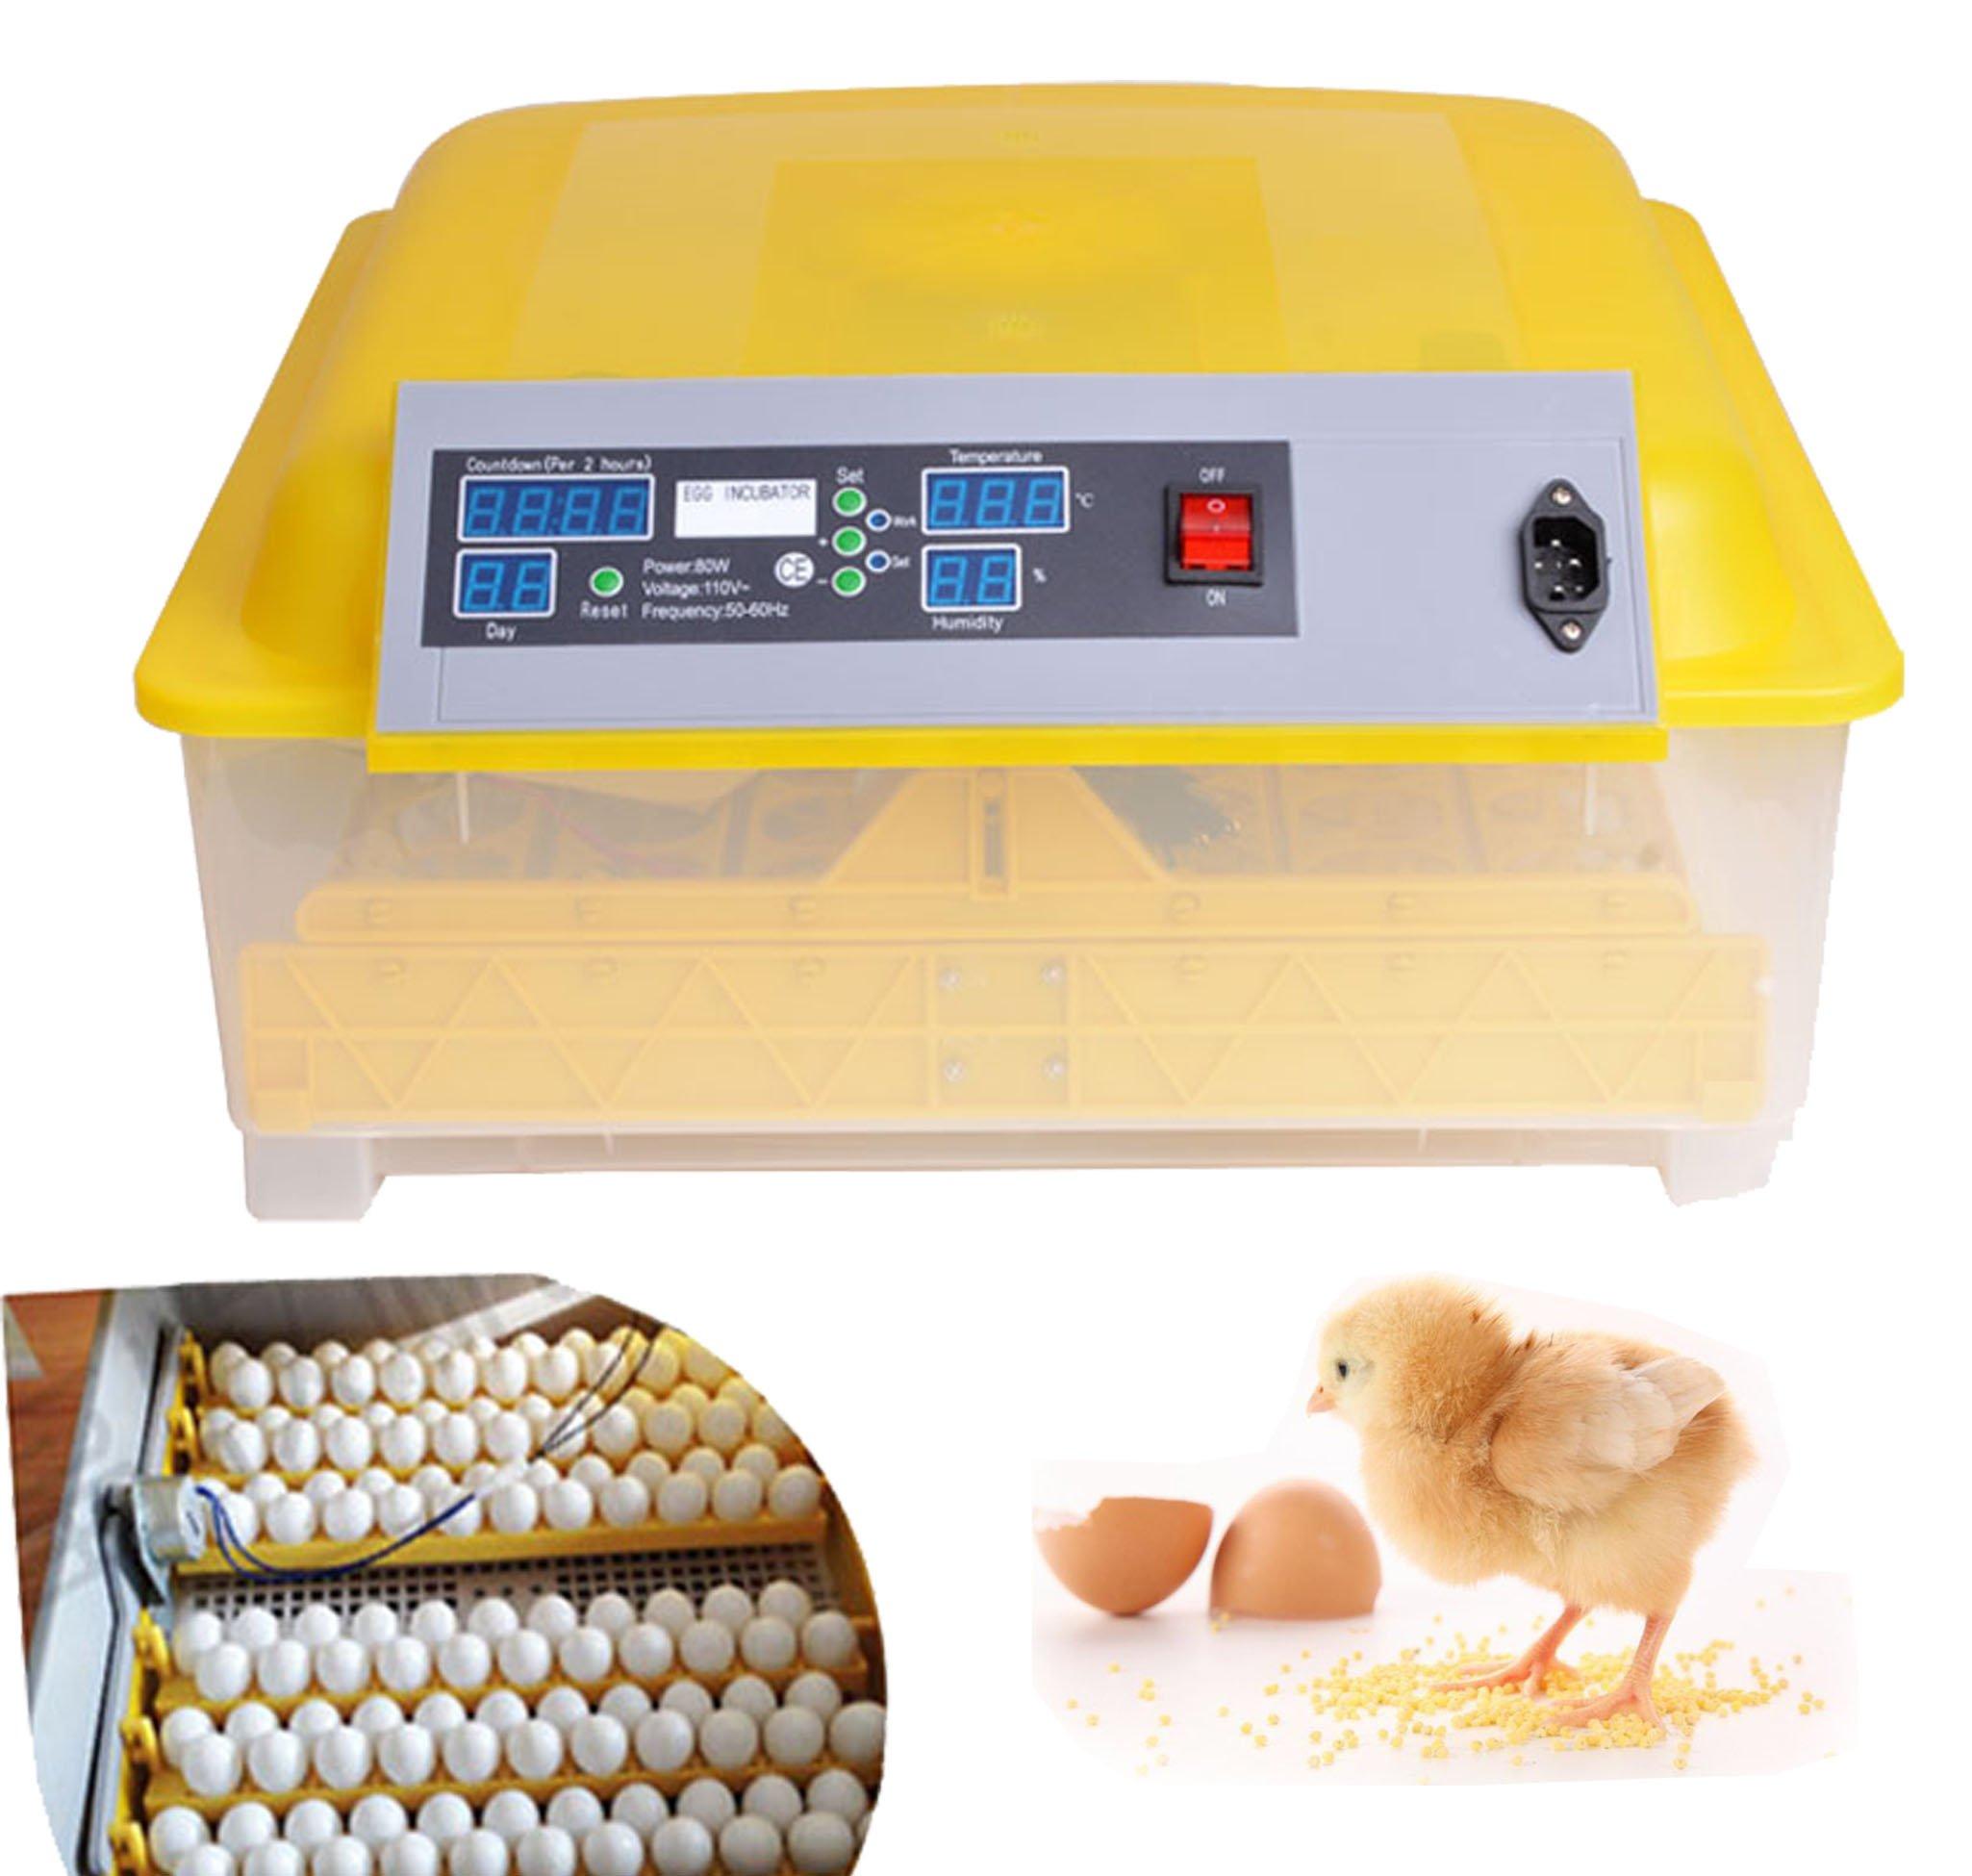 Oanon 48 Egg Incubator, Automatic 48 Digital Egg Hatcher Turning Temperature Control, Poultry Auto-Turning Egg Incubator Poultry Hatcher for Chickens Ducks Birds[US Plug]